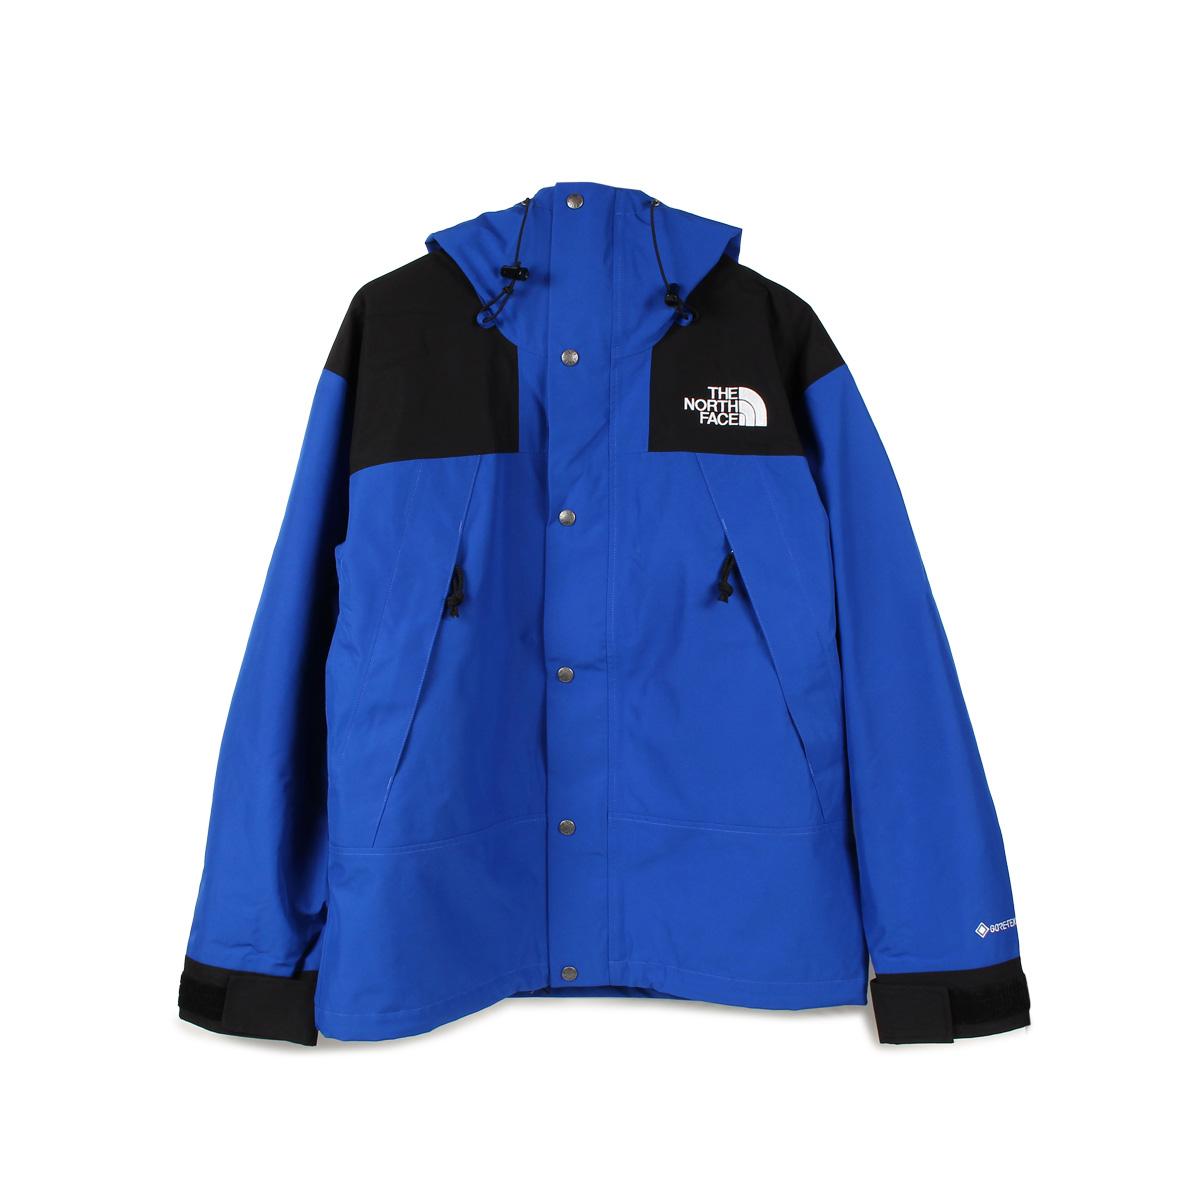 THE NORTH FACE 1990 MOUNTAIN JACKET GTX 2 ノースフェイス マウンテン ジャケット マウンテンジャケット メンズ ブルー NF0A3XEJ